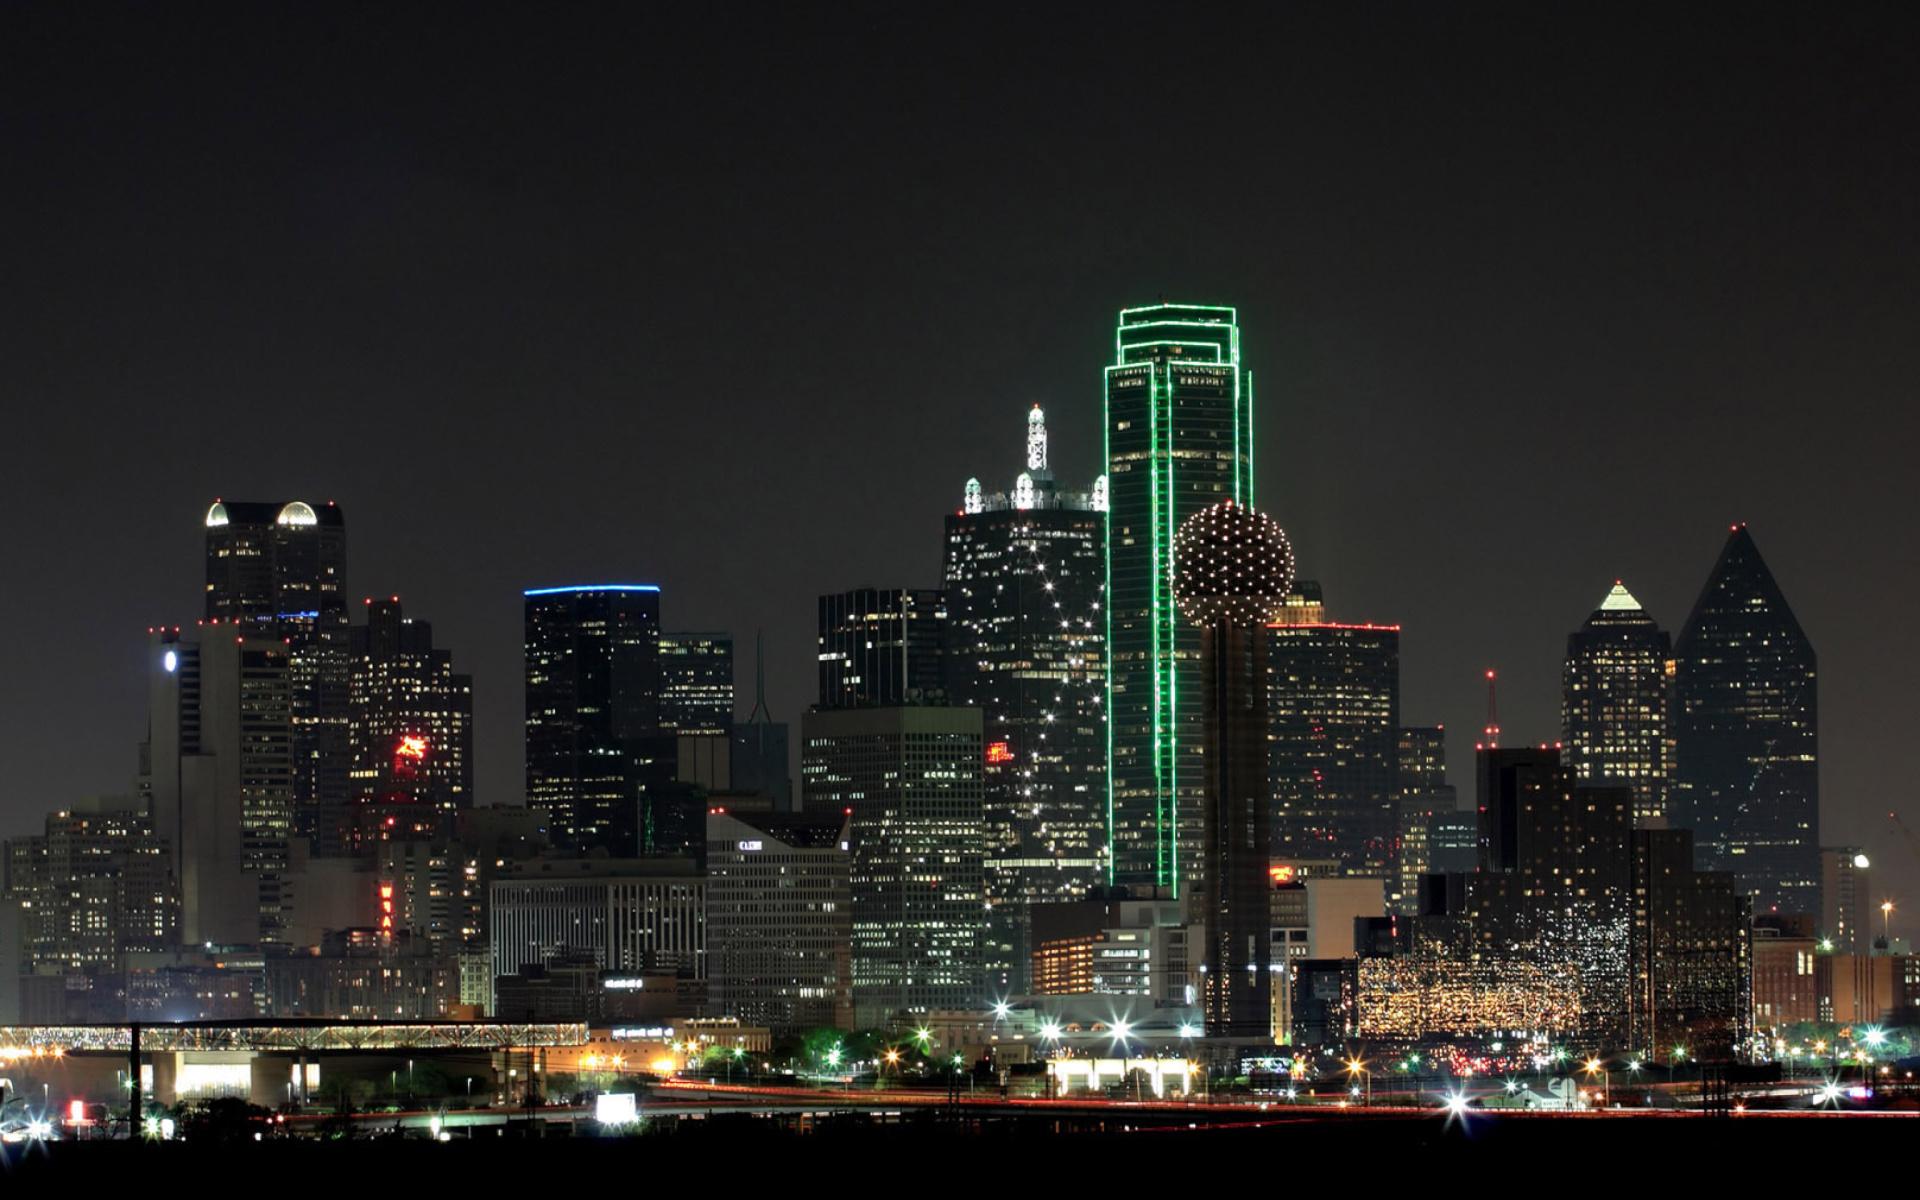 dallas texas wallpaper hd - photo #9